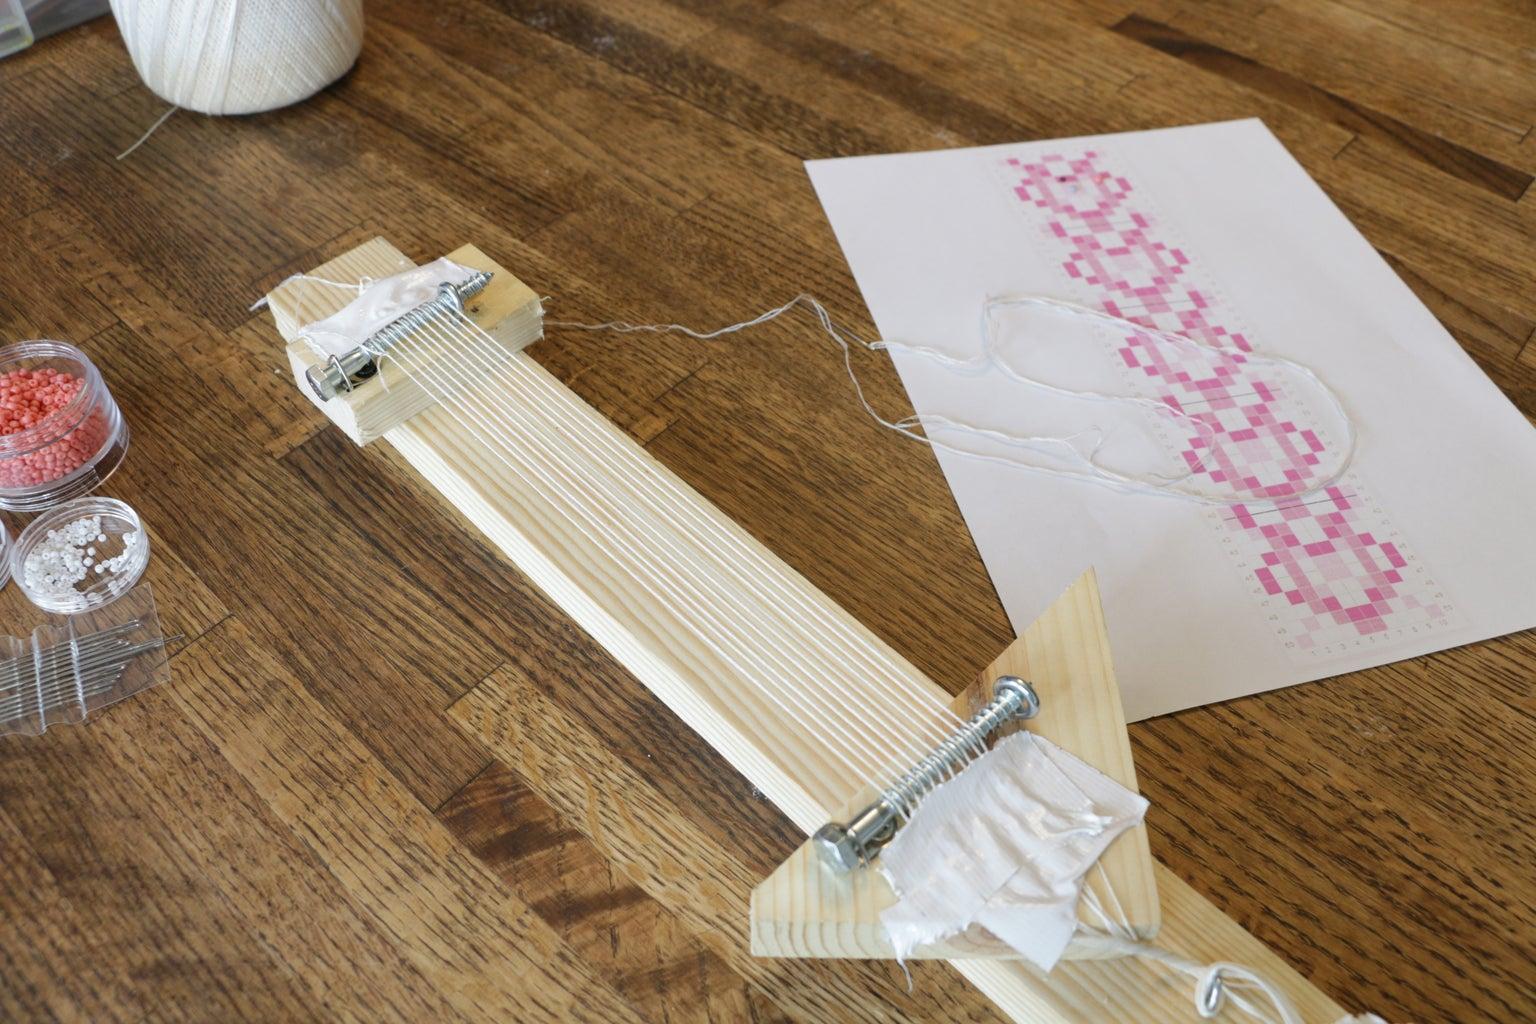 Materials for Loom & Bracelet